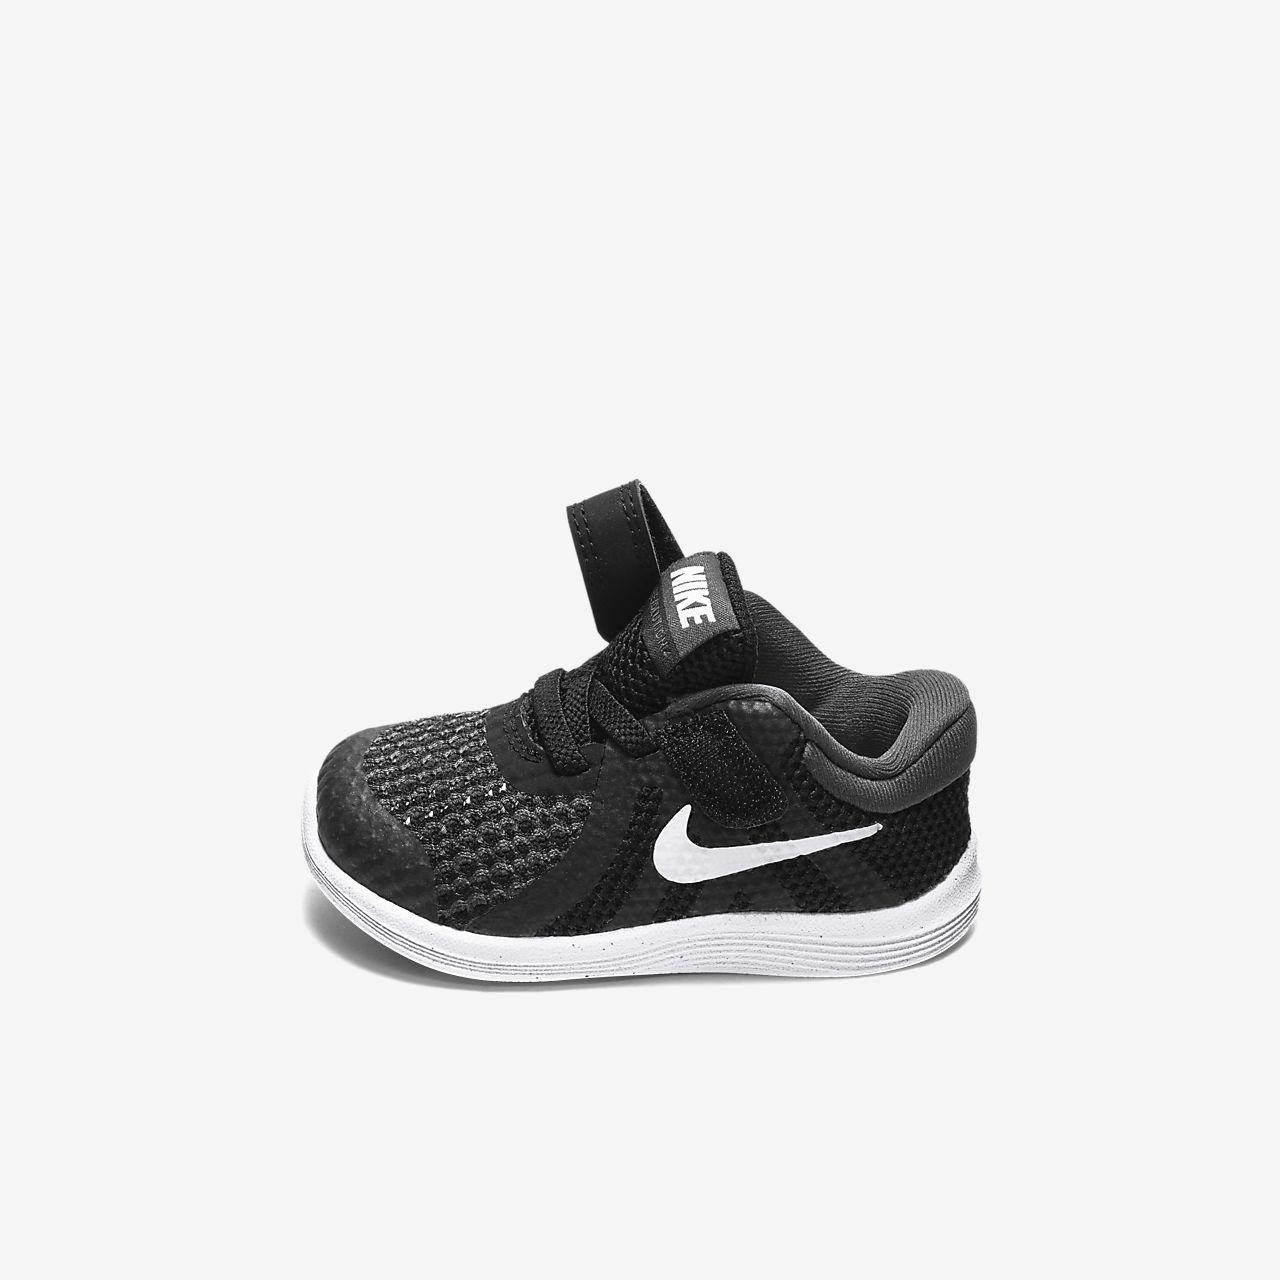 timeless design 49e36 ebbe5 Low Resolution Nike Revolution 4 Bebek Ayakkabısı Nike Revolution 4 Bebek  Ayakkabısı